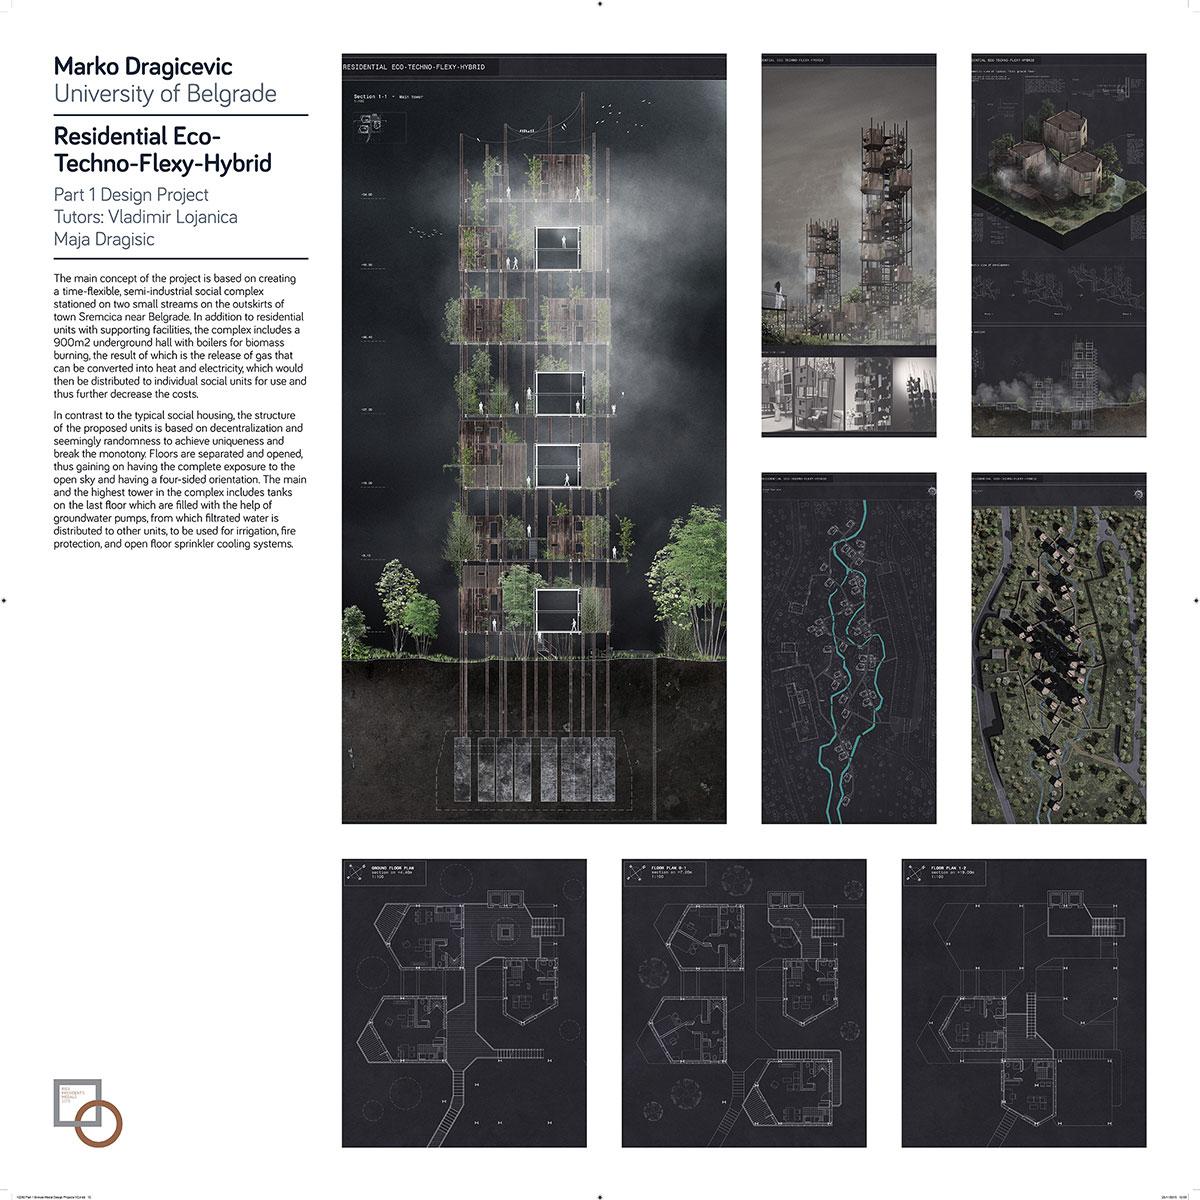 PM2015-Slide18_Marko-Drgaicevic